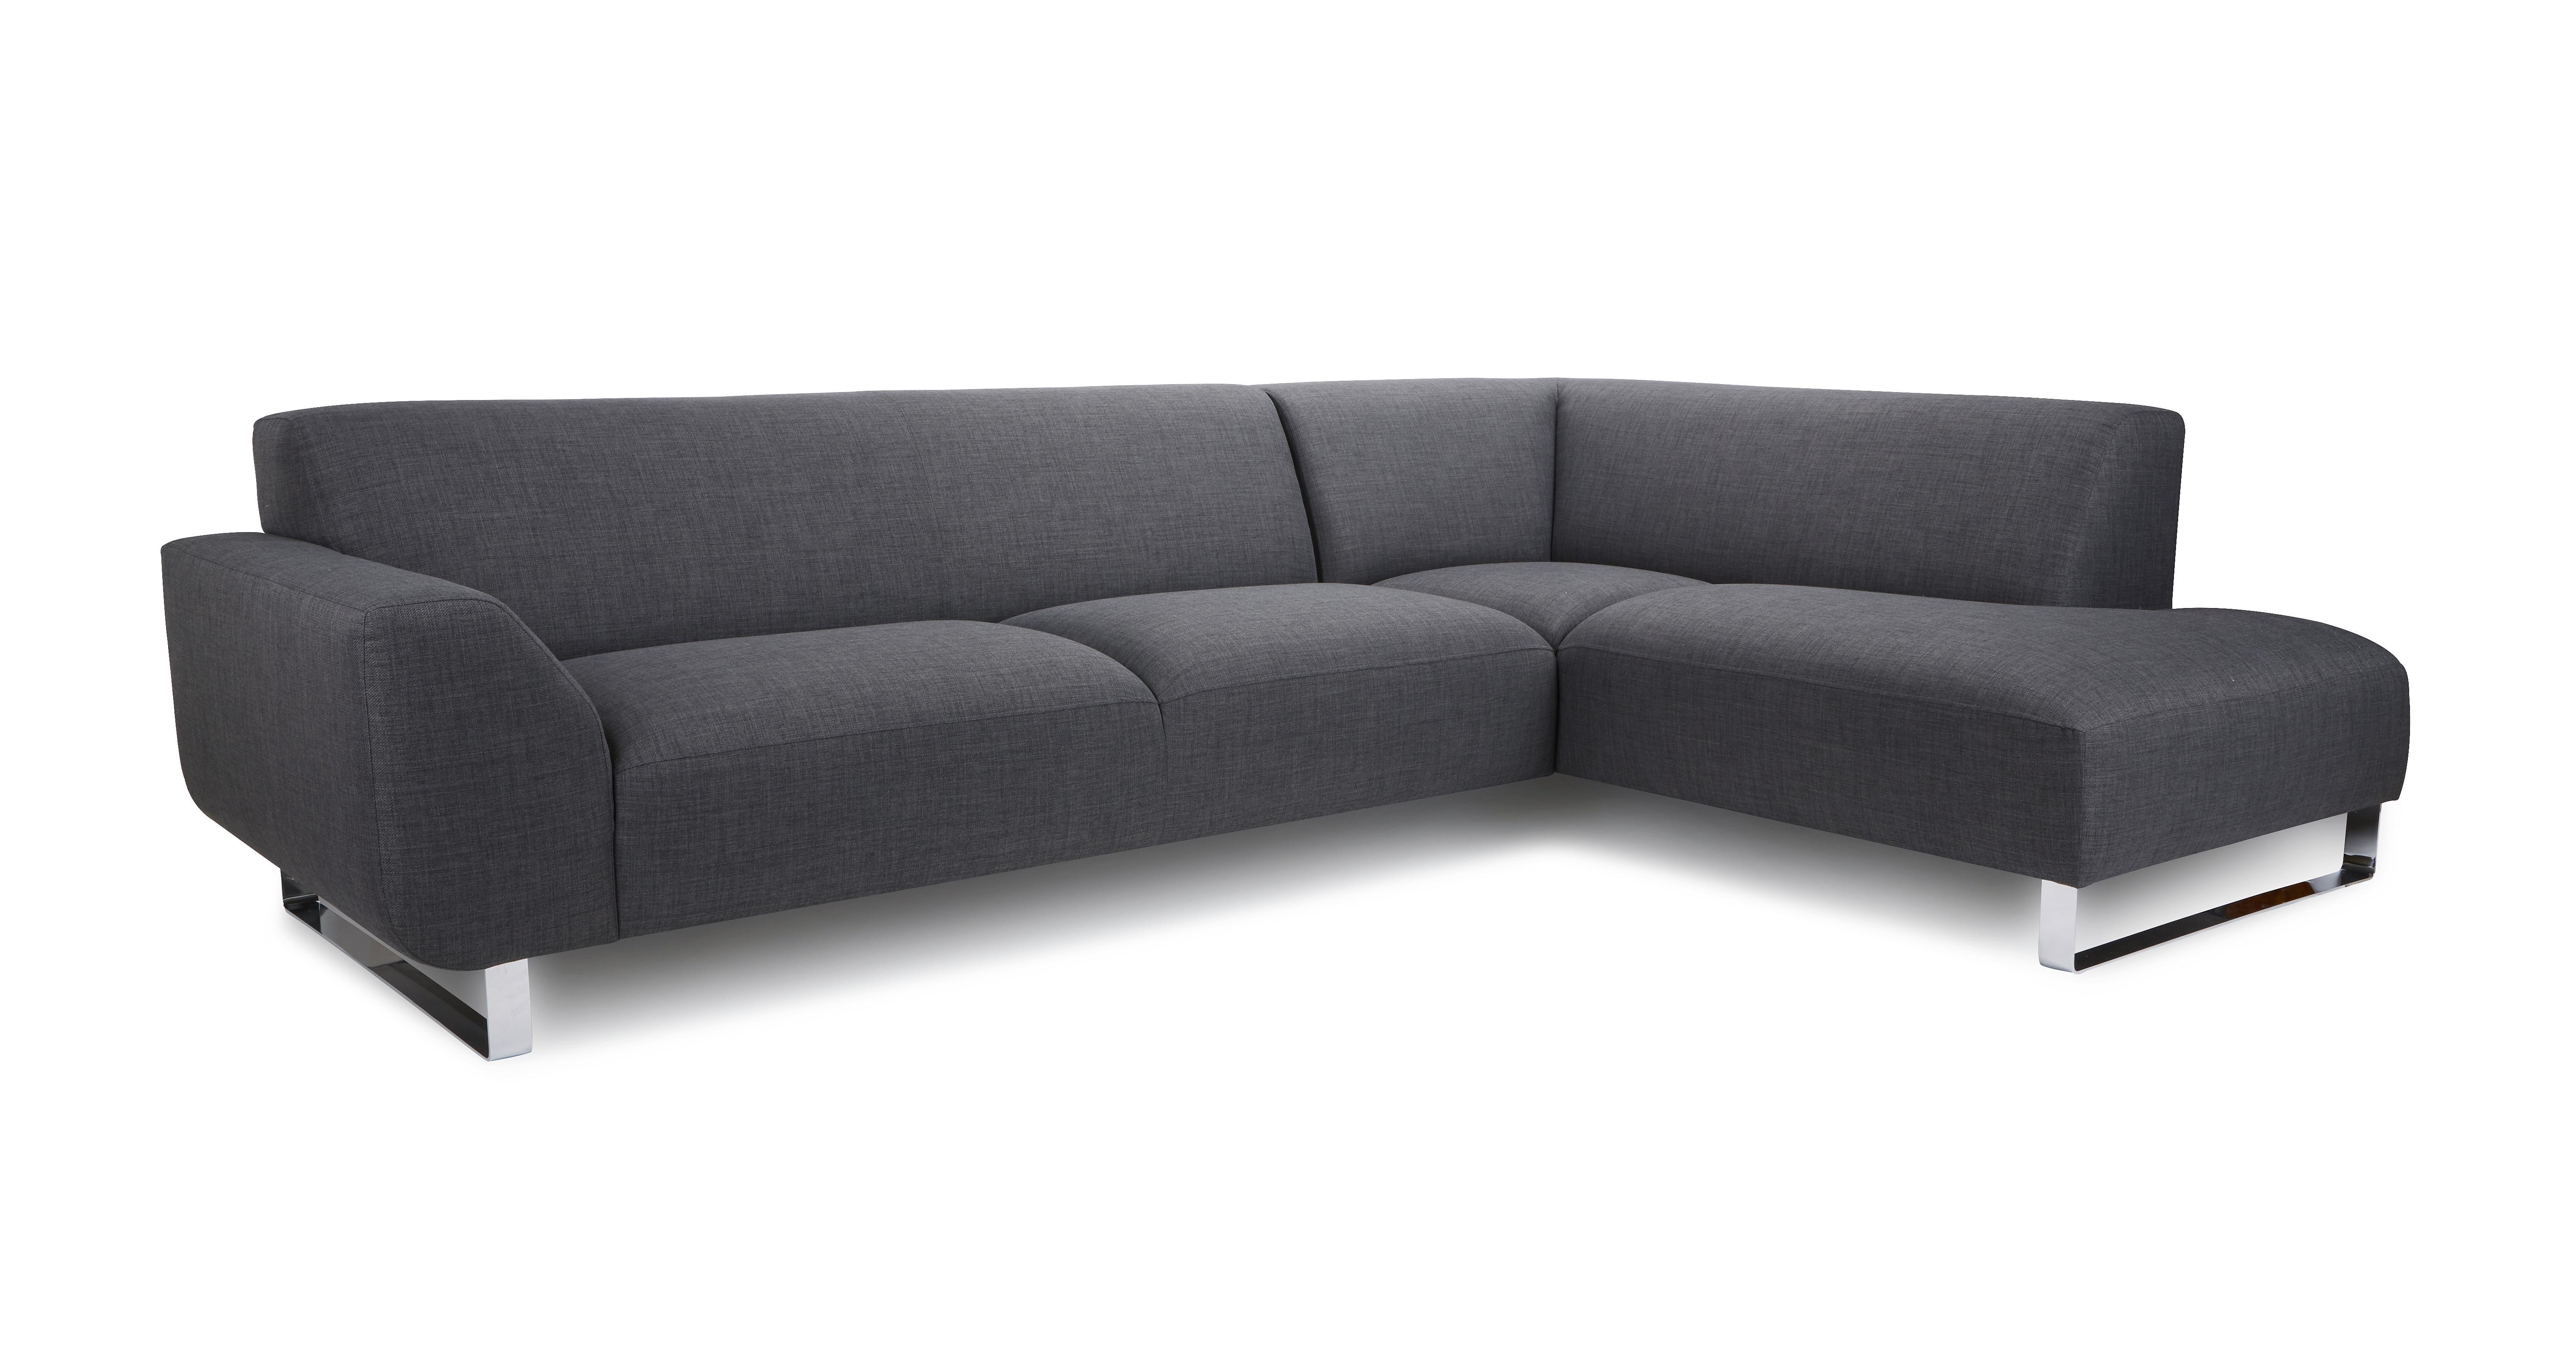 sofa company nl reviews sofas for under 100 hardy left hand facing arm corner revive dfs banken